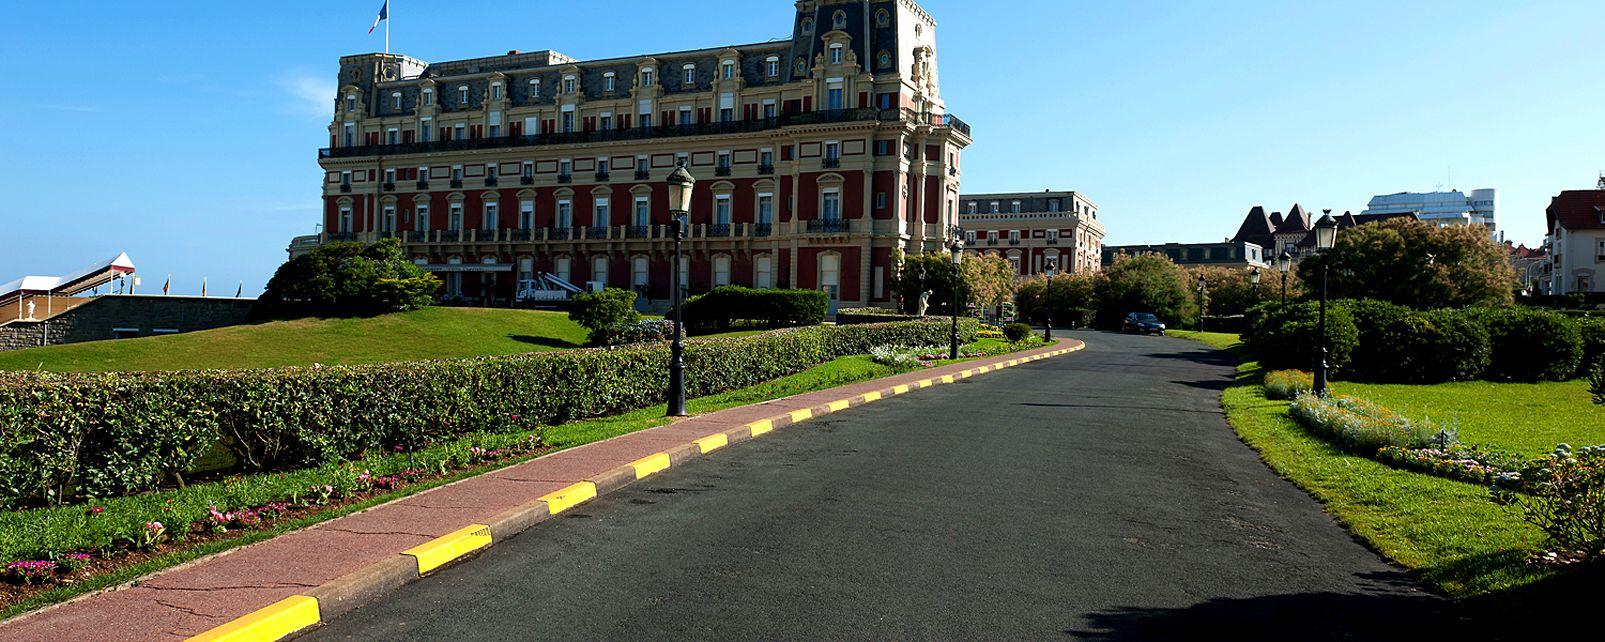 Hôtel Hôtel du Palais Imperial Resort Spa